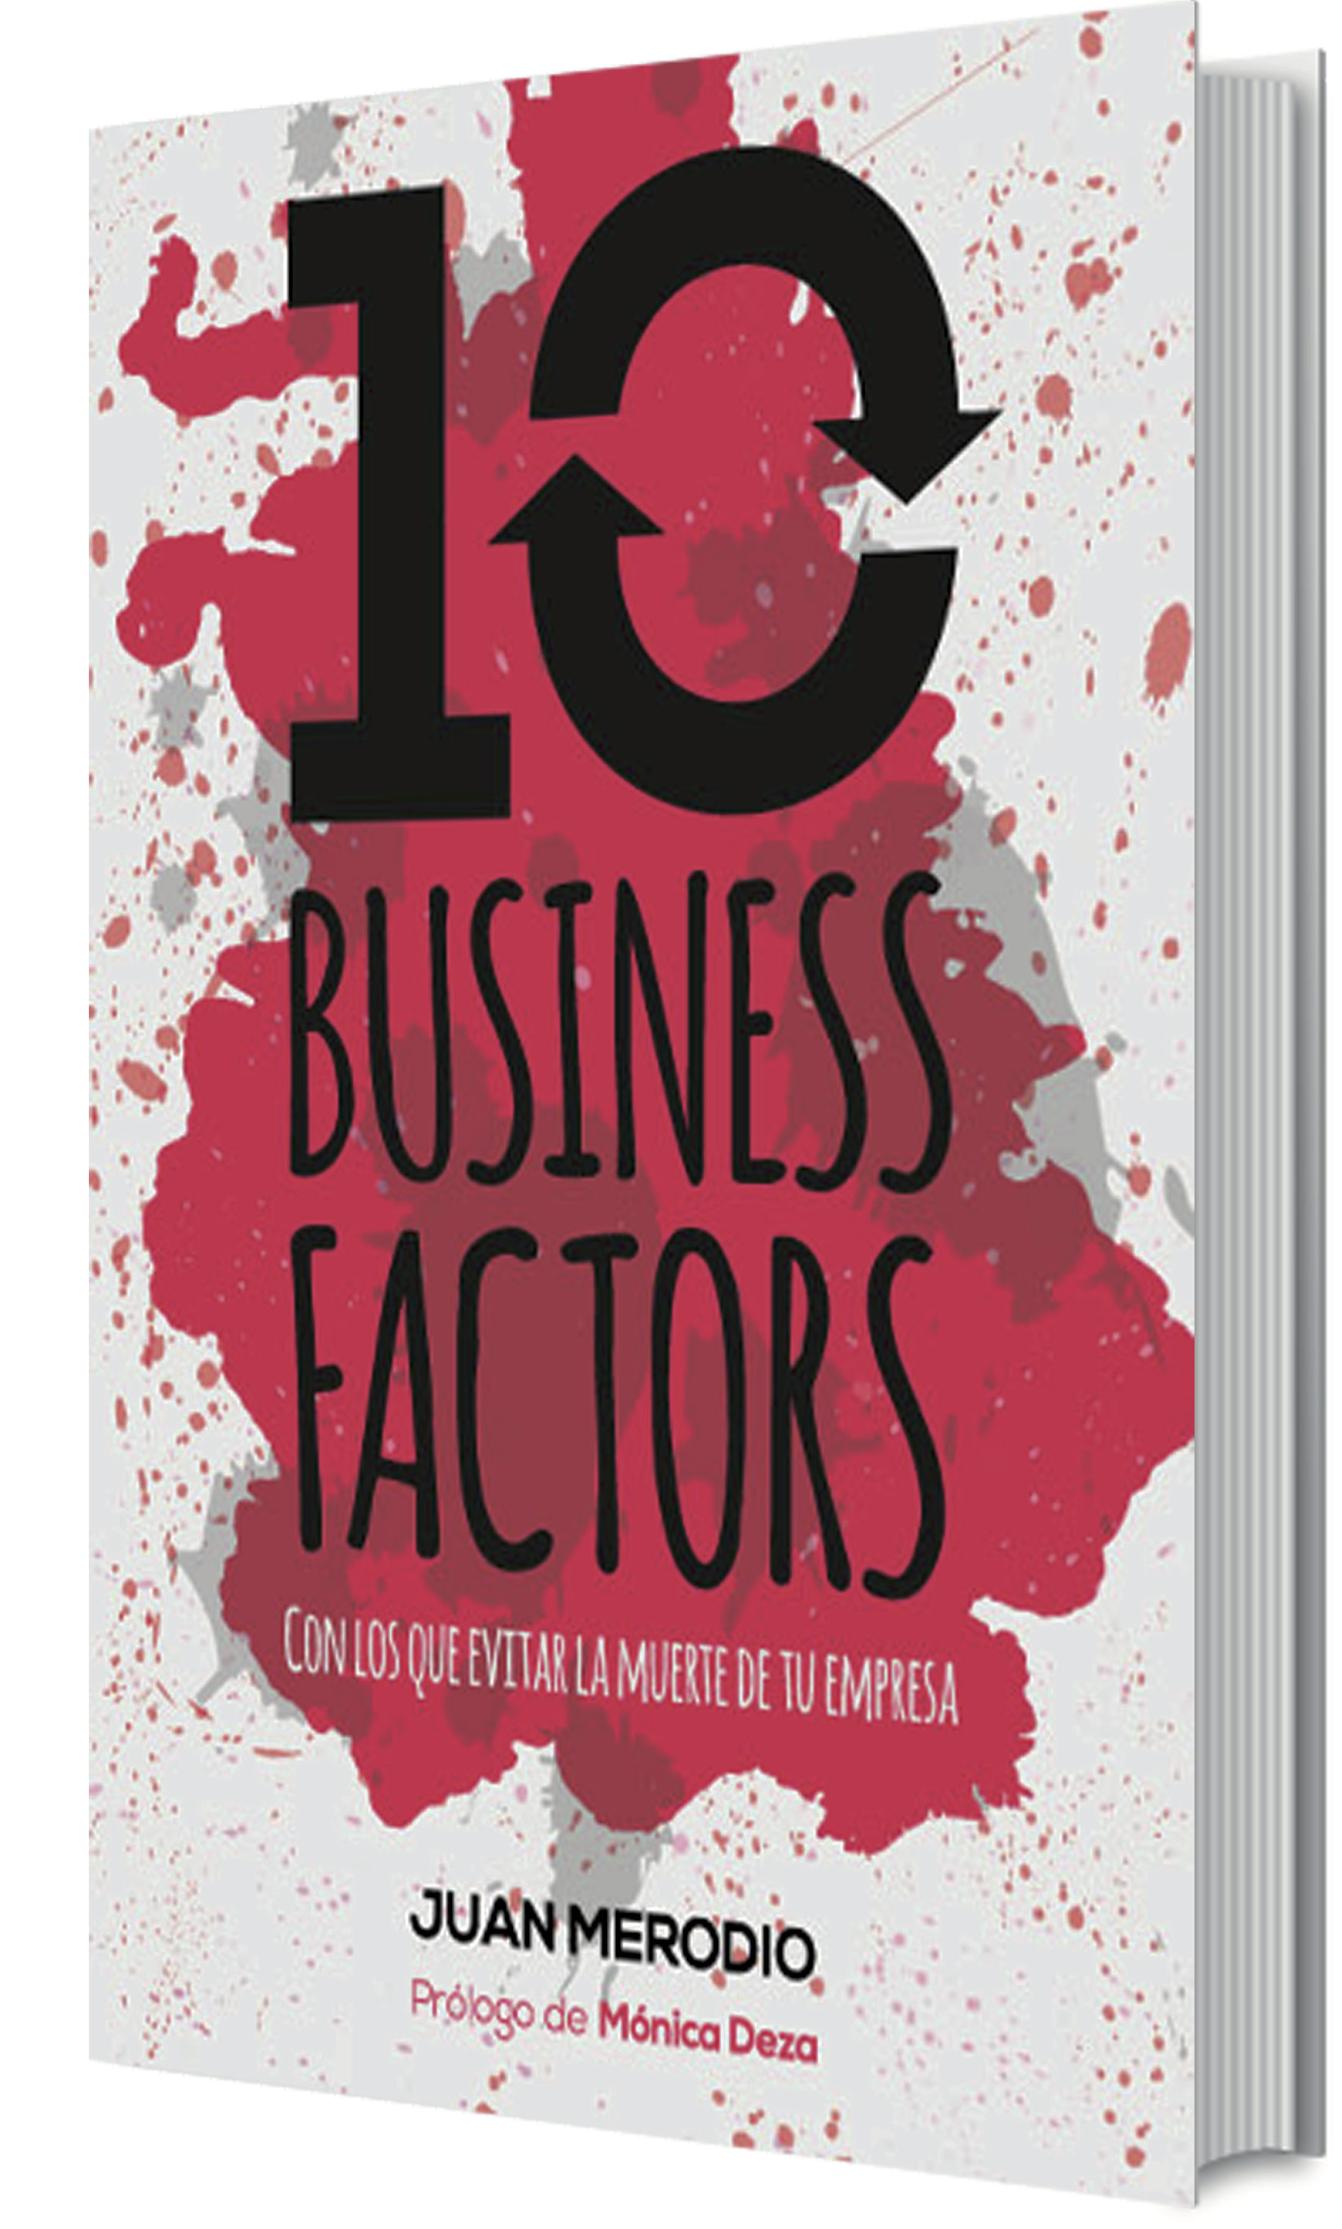 Libro Juan Merodio - 10 Business Factors